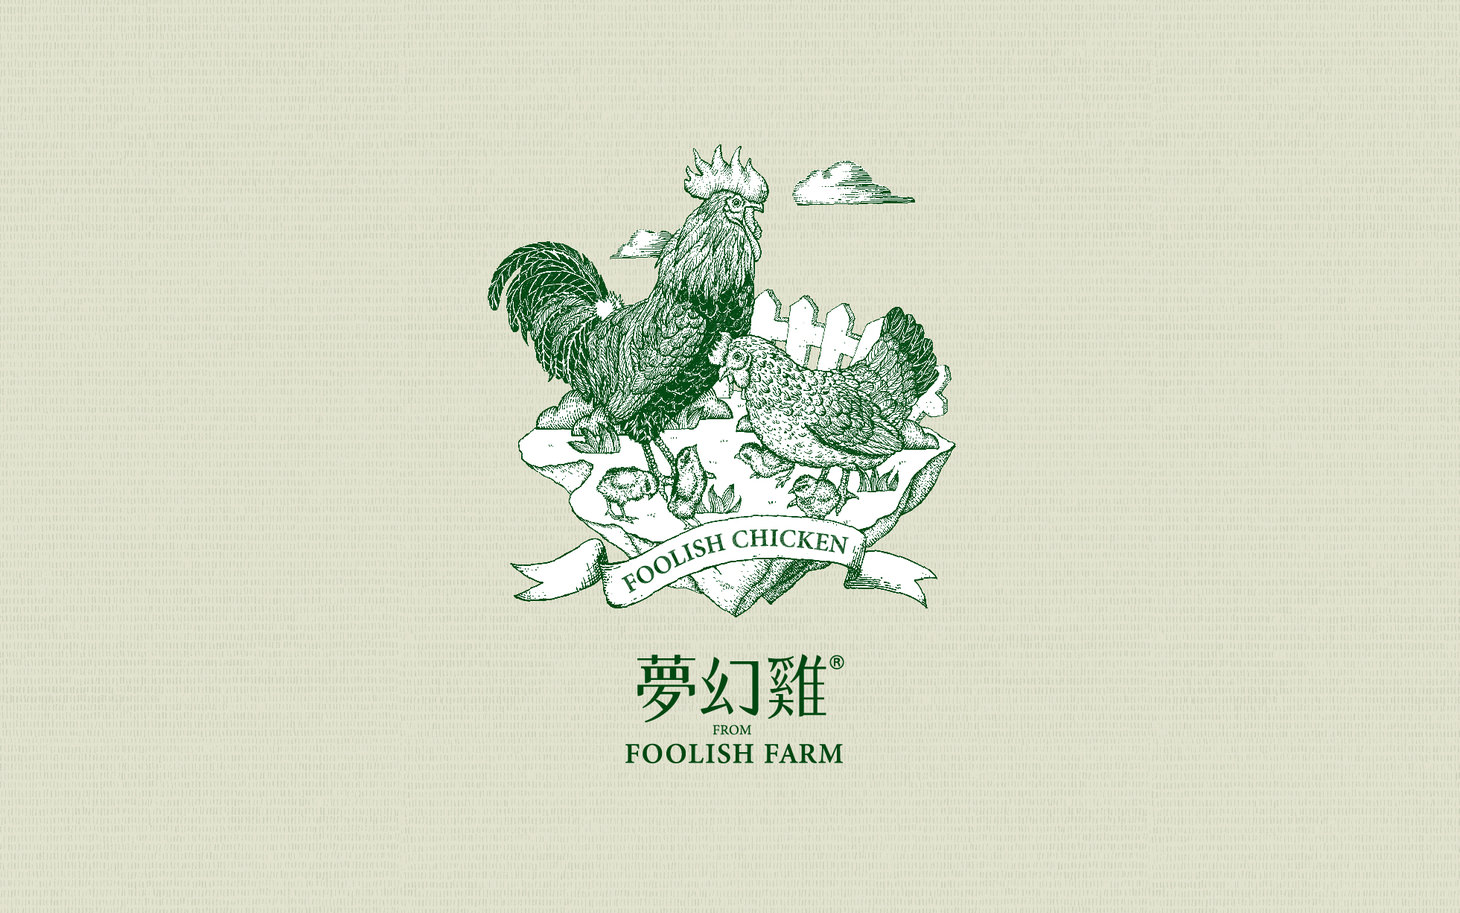 YUR_愚人農場_LOGO_20150213_3-04-04.jpg